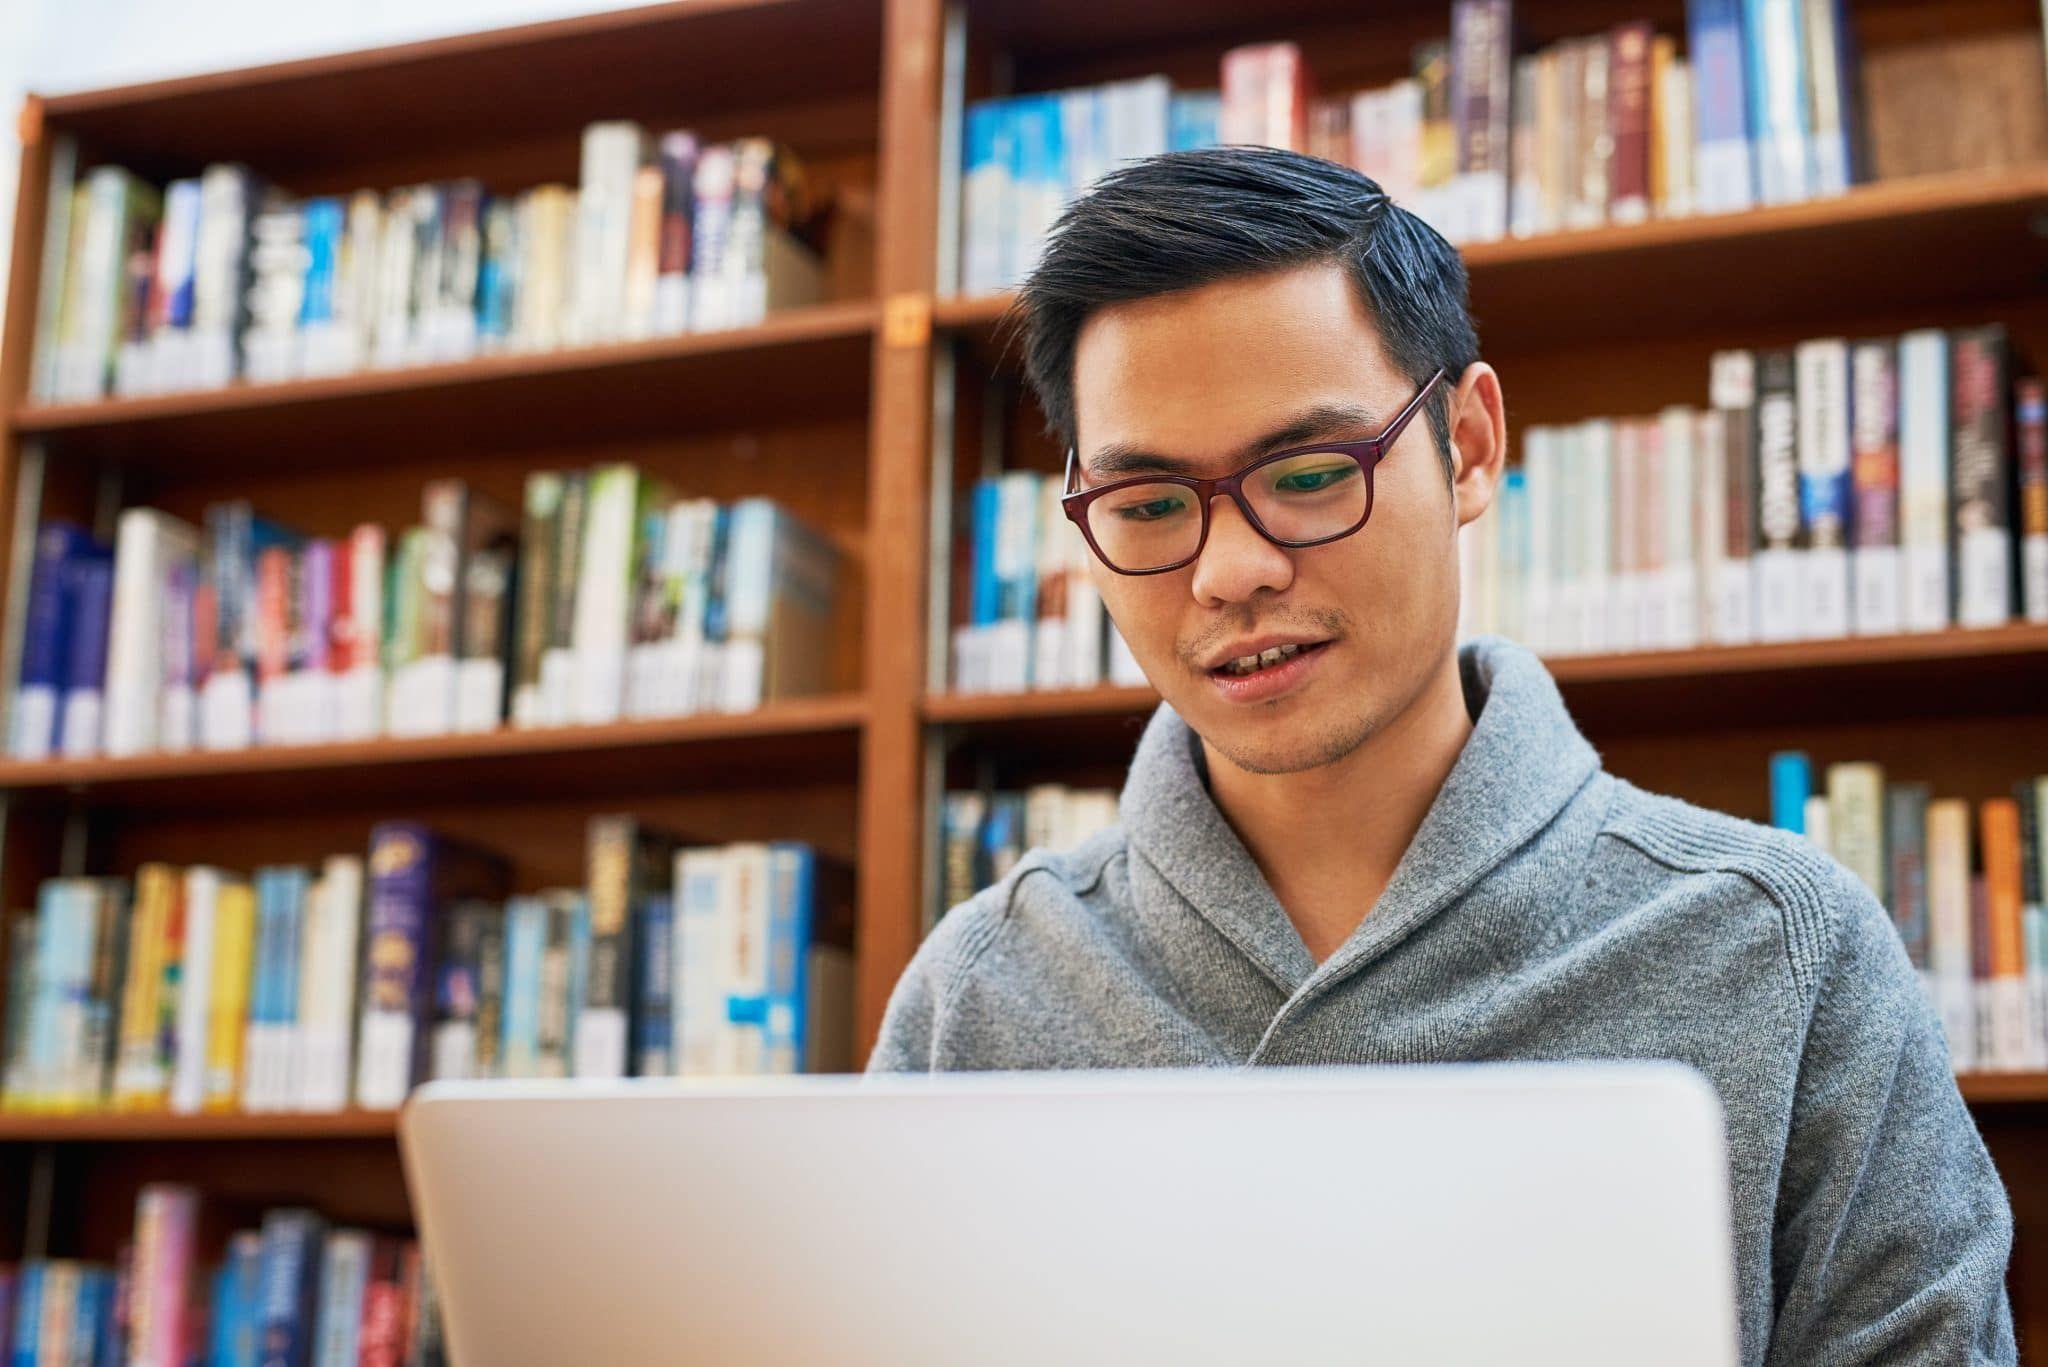 Career planning resume writing activities in 2020